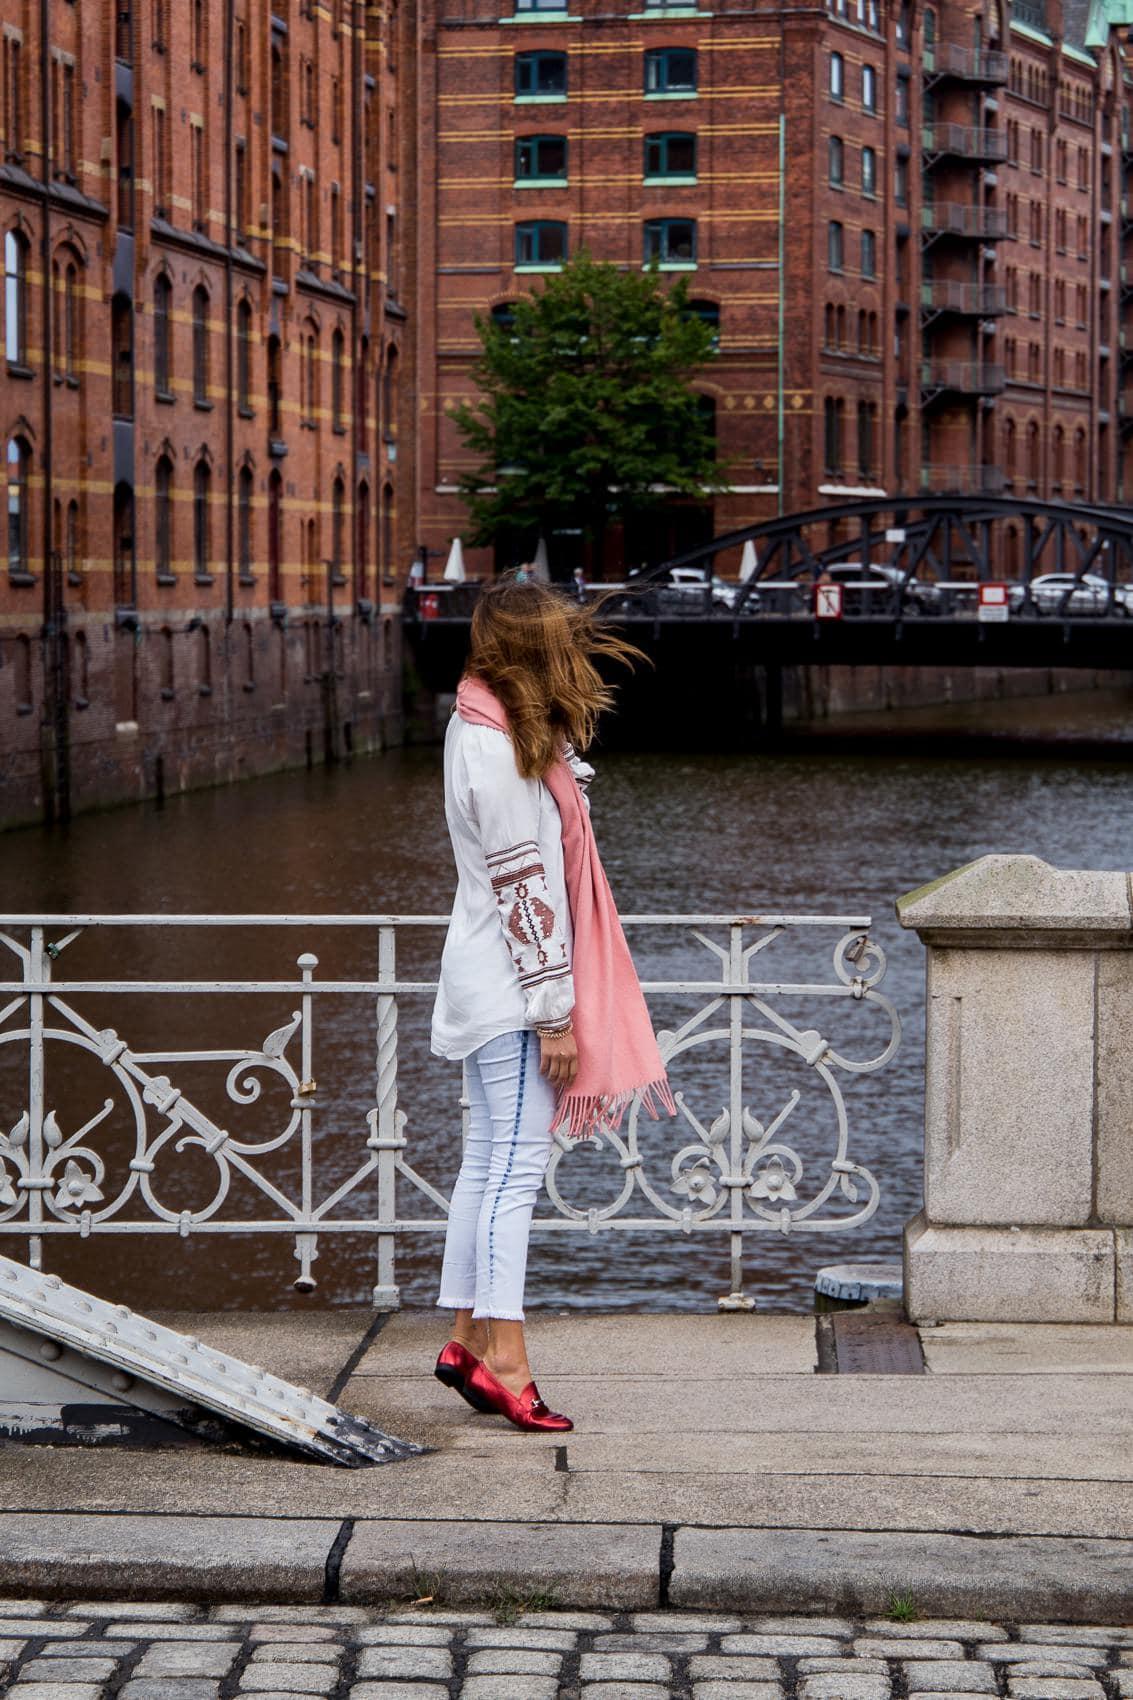 Boho Bluse, Acne Studios Canada Schal & Metallic Loafers in Hamburg